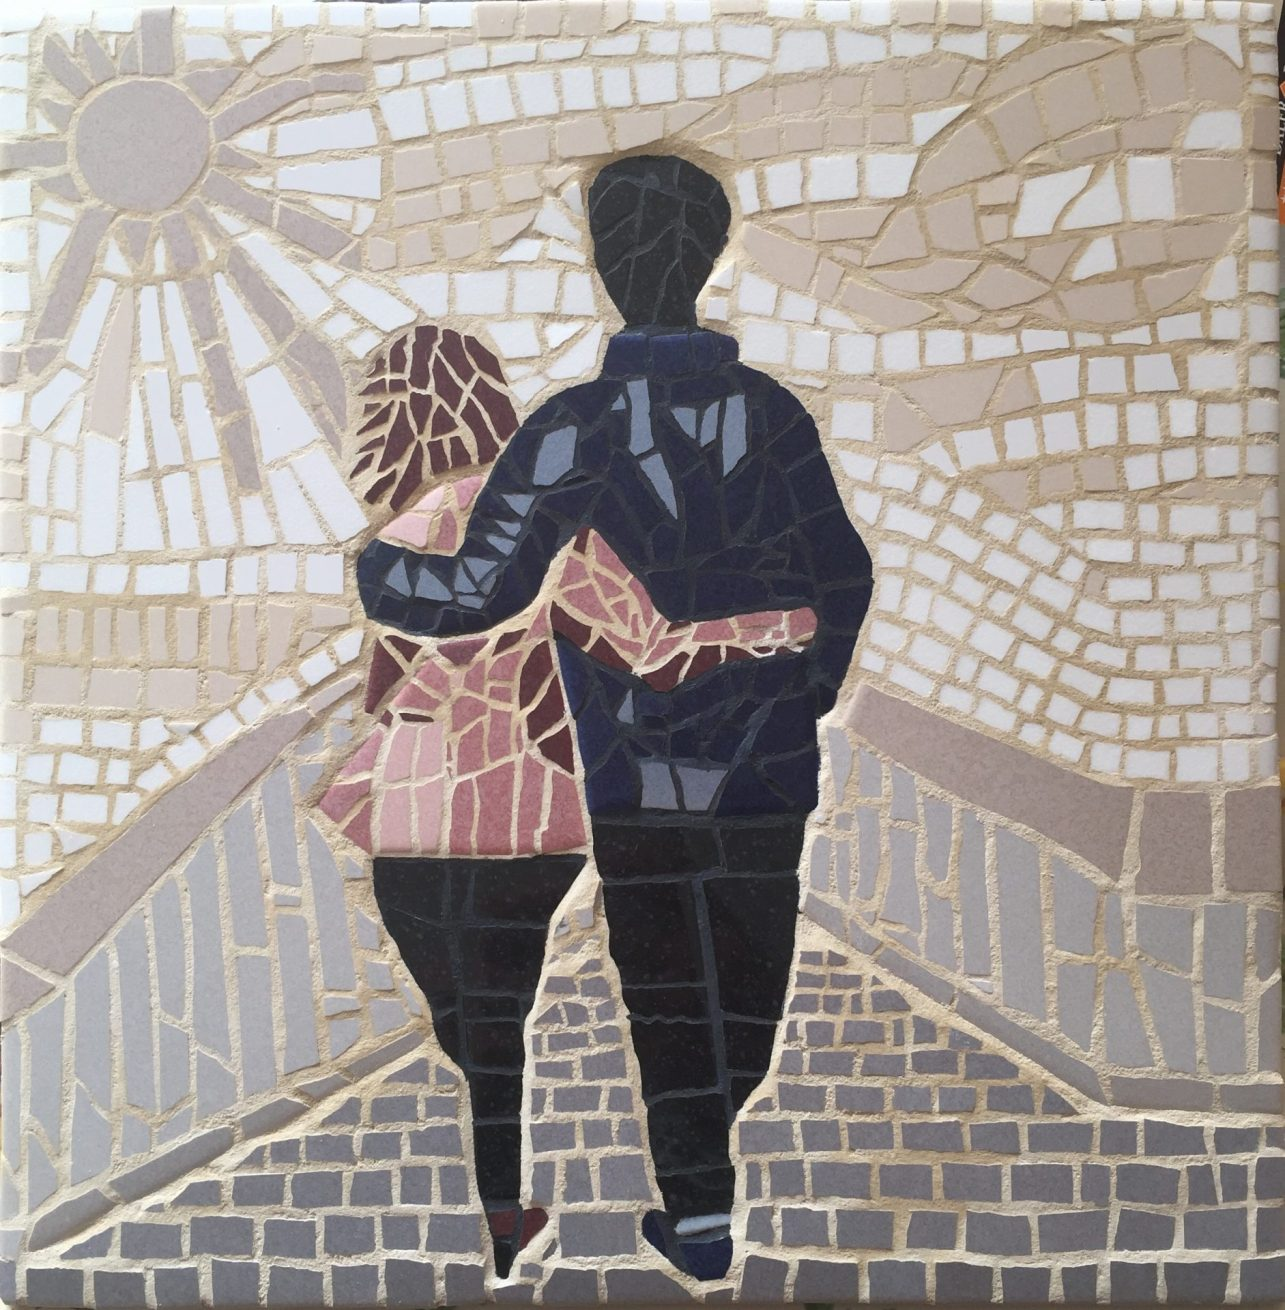 'We will walk together' Mosaic by Wild Geckos Mosaics & Designs